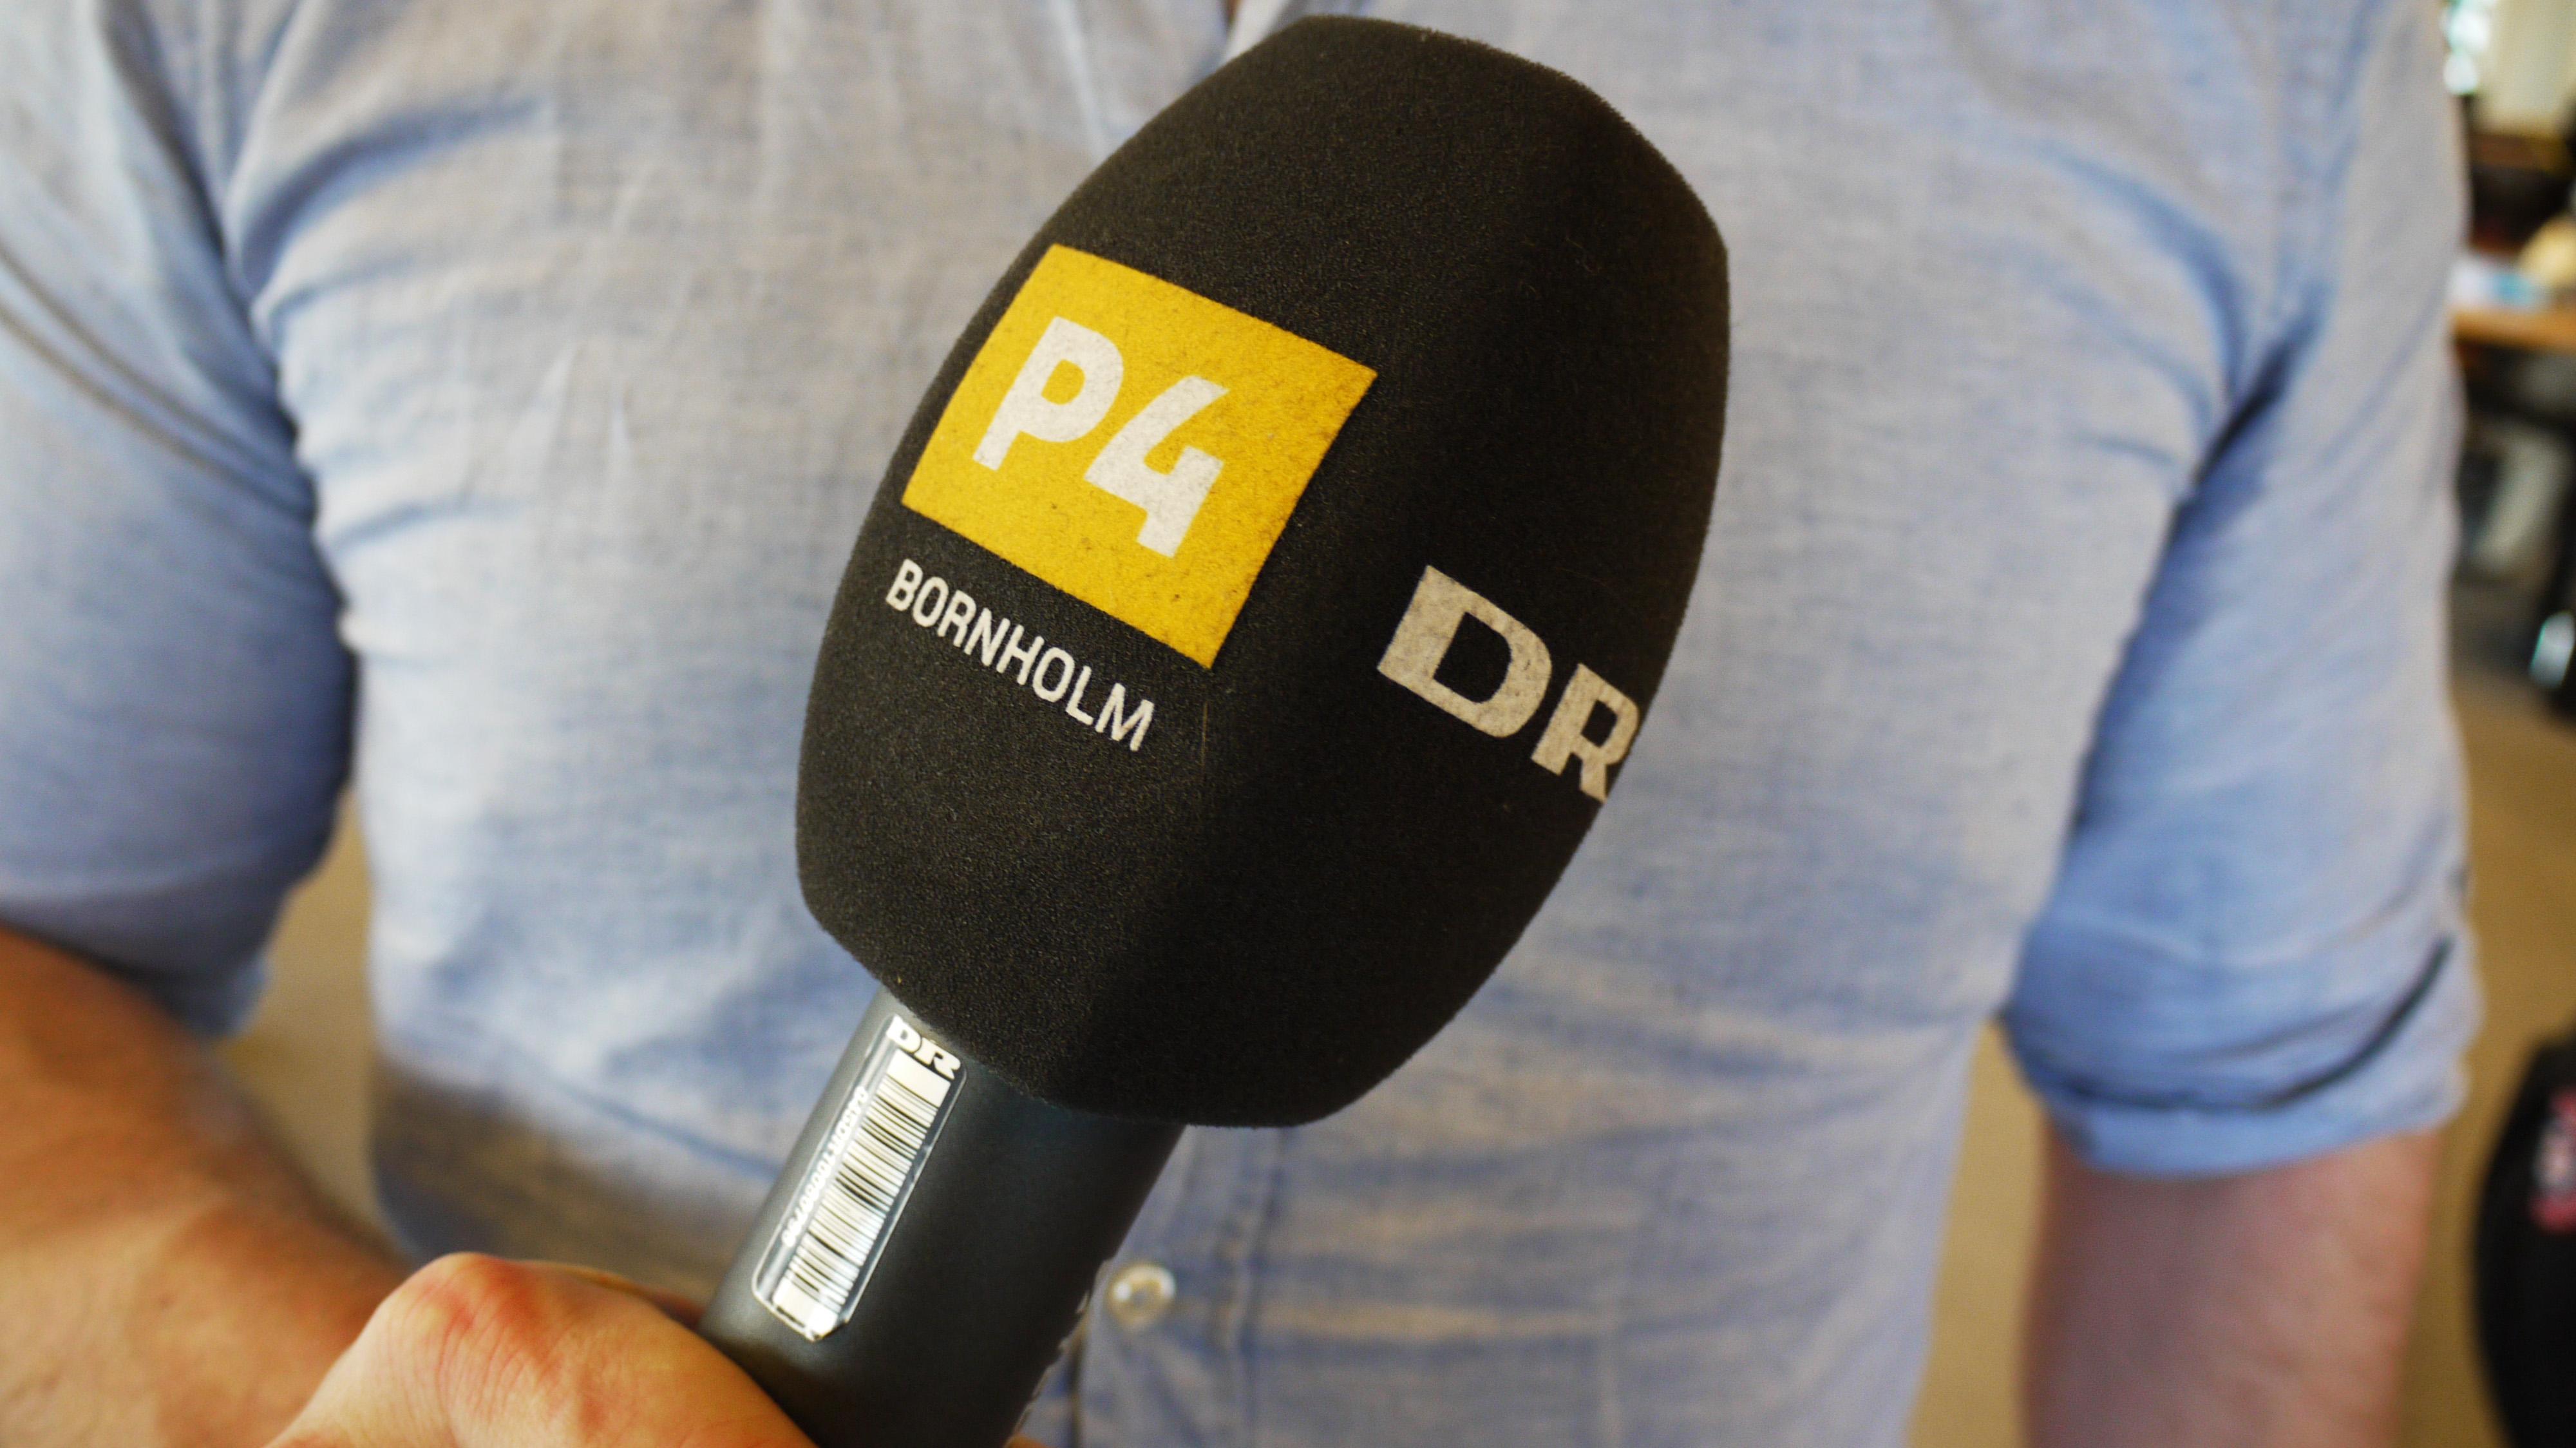 DR P4 Bornholm